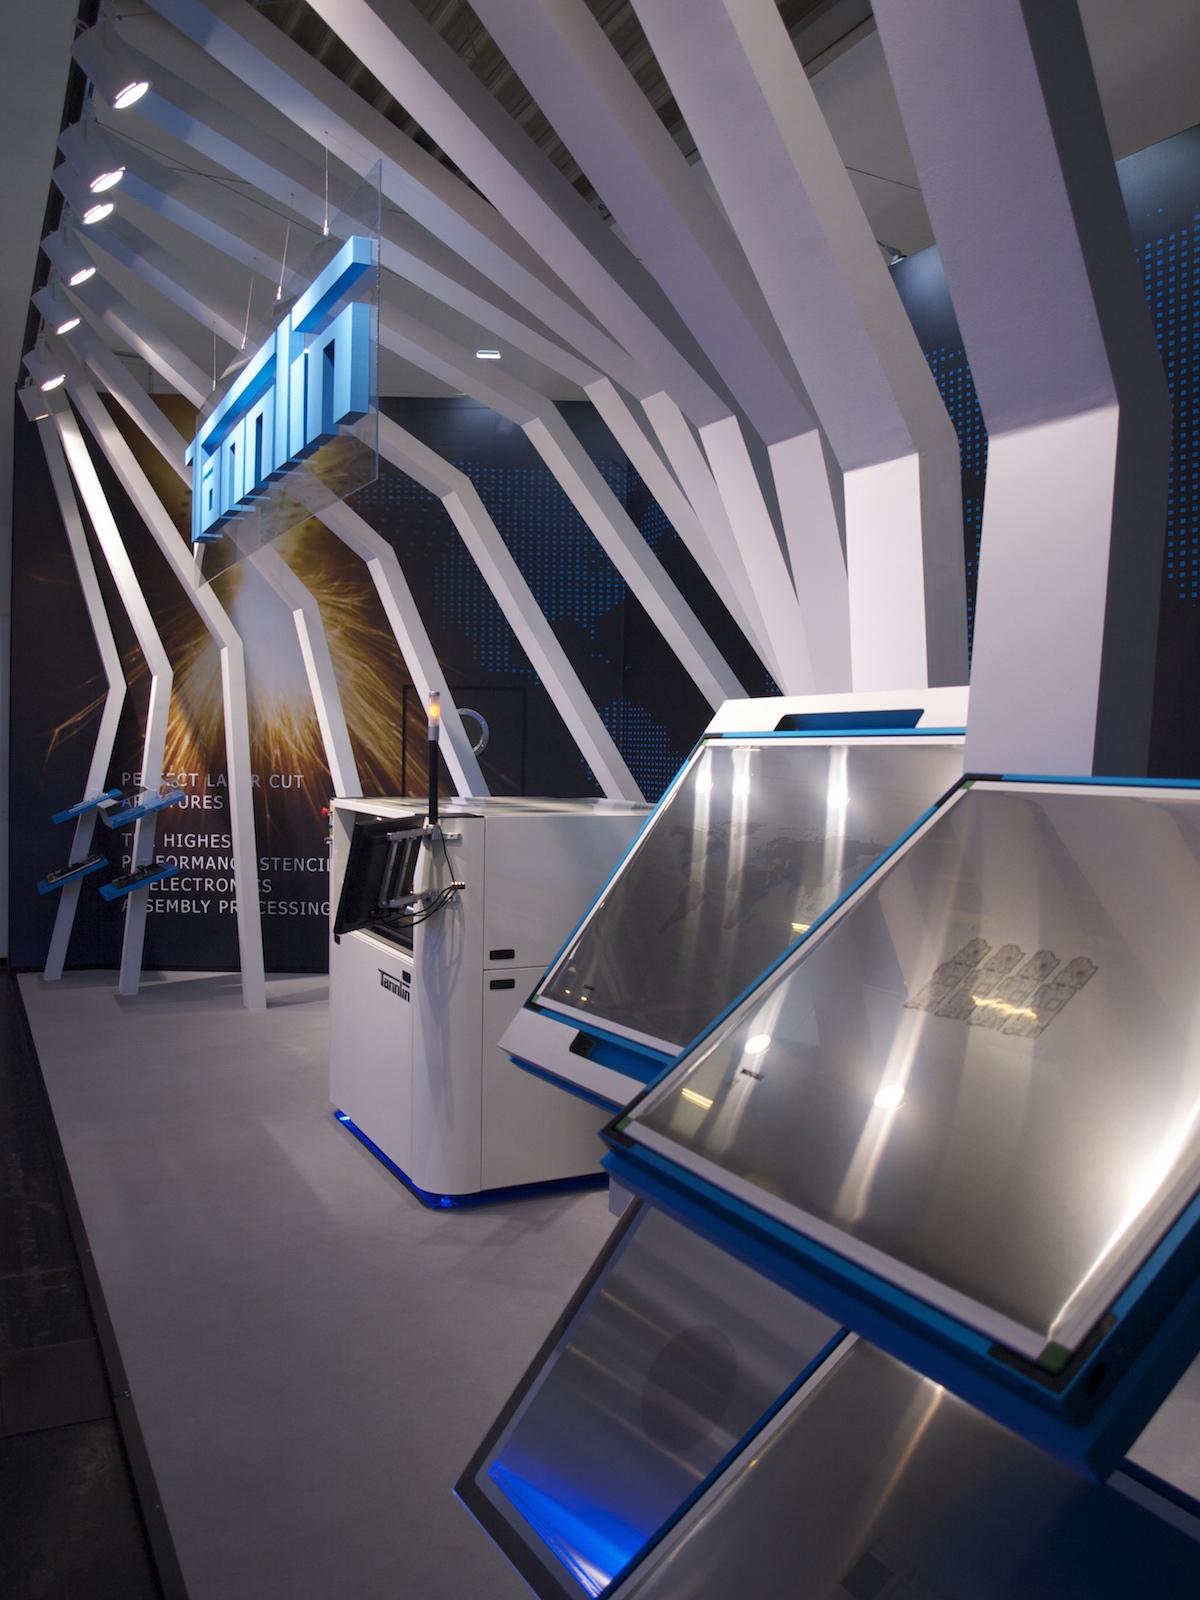 custom exhibition booth design build